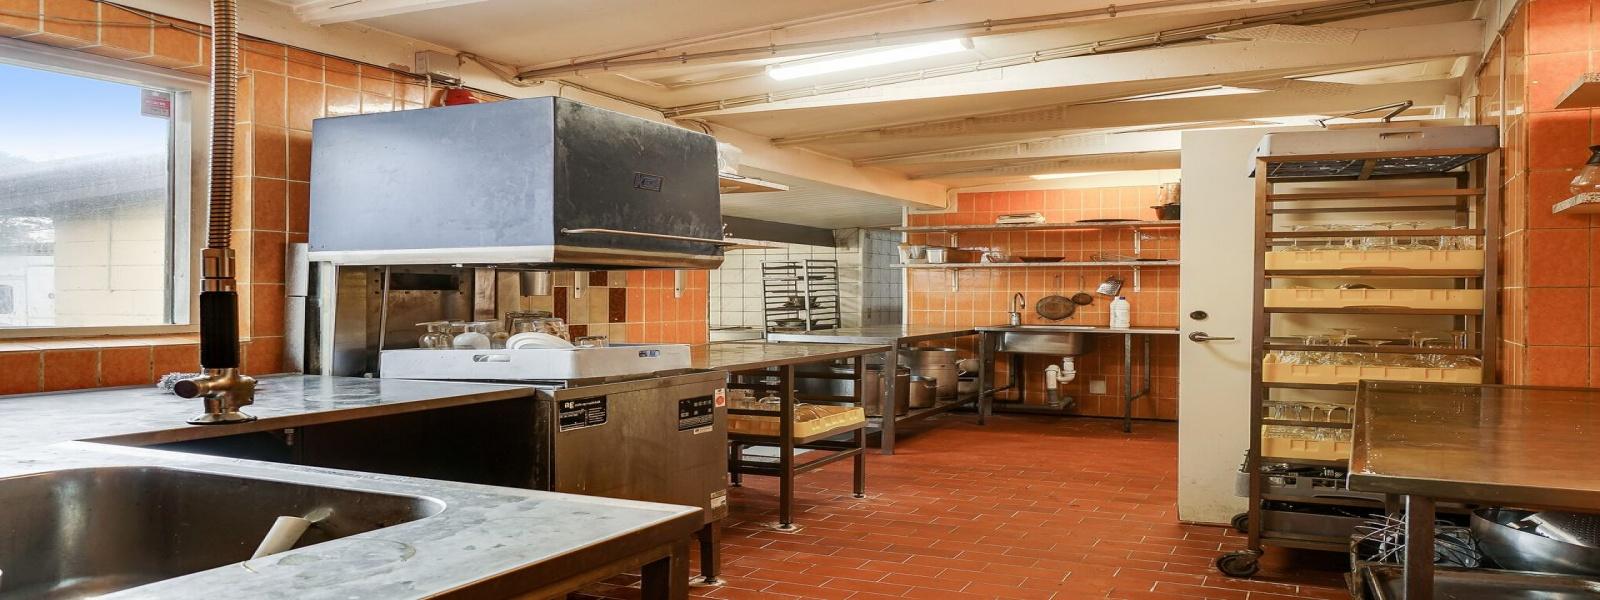 Restaurant,Solgt,1328